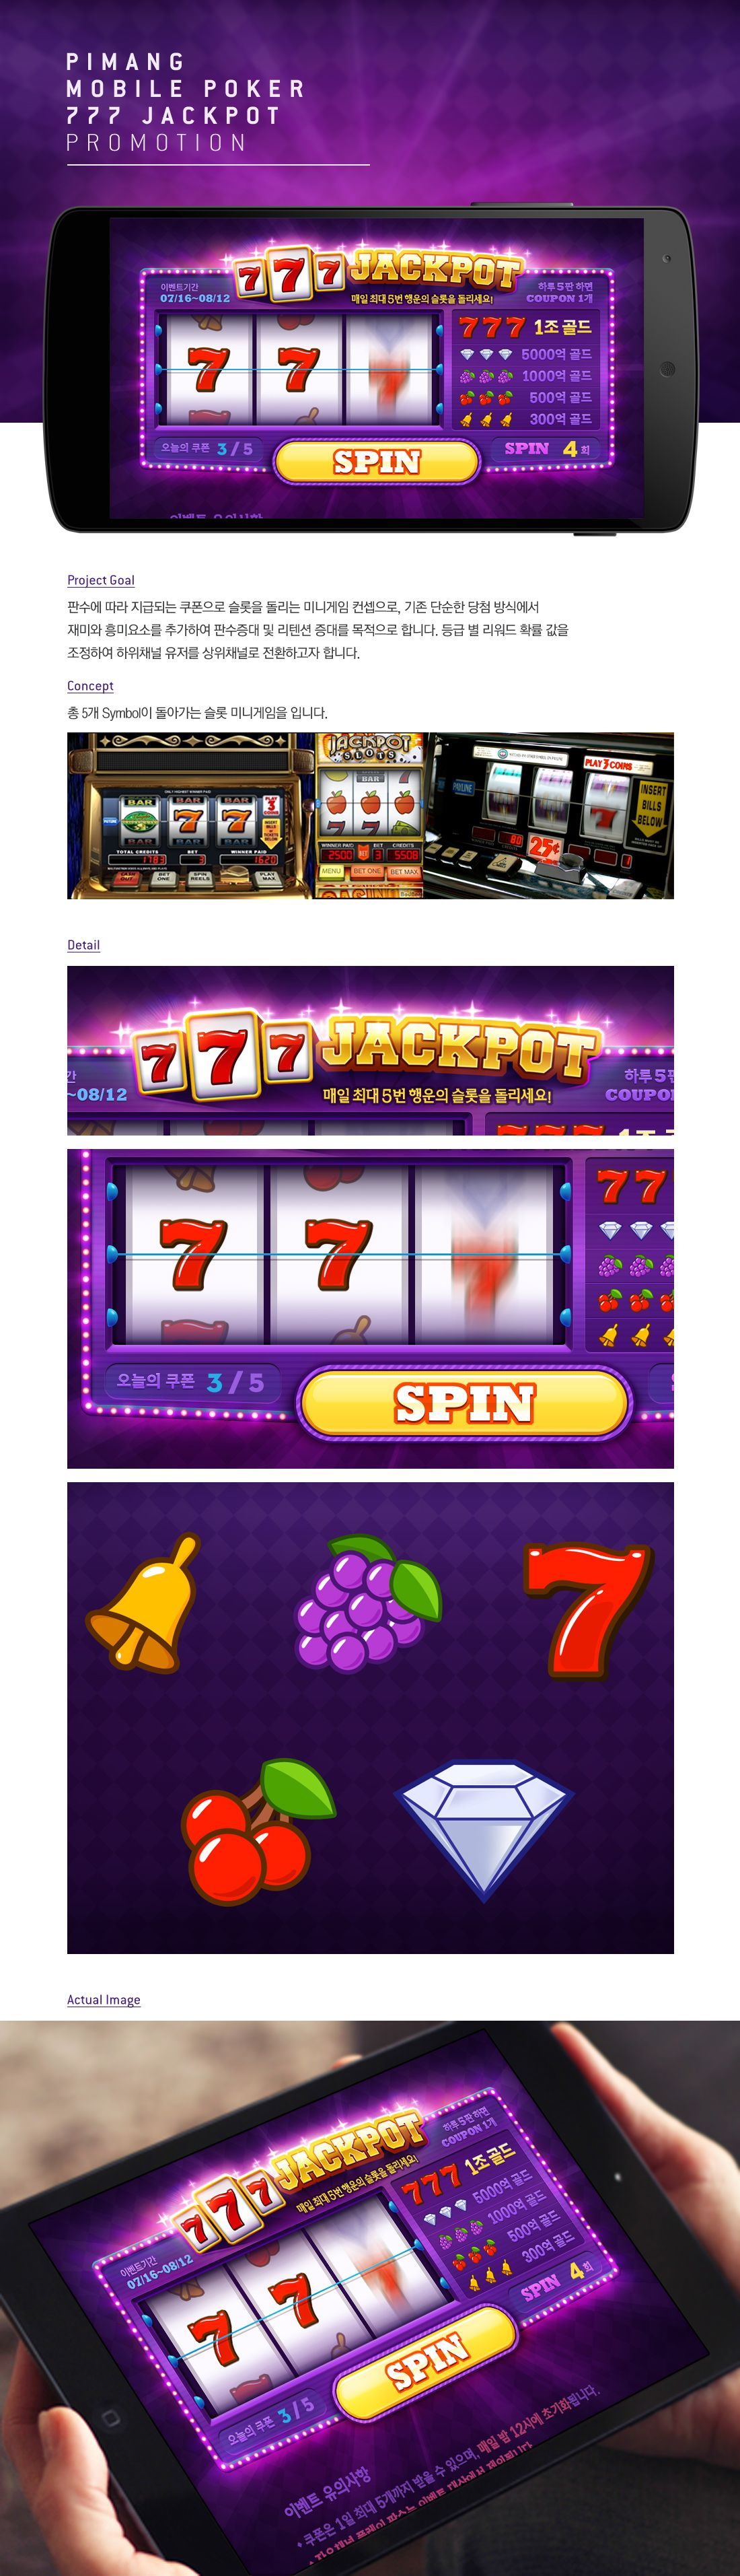 Best Casino Internet